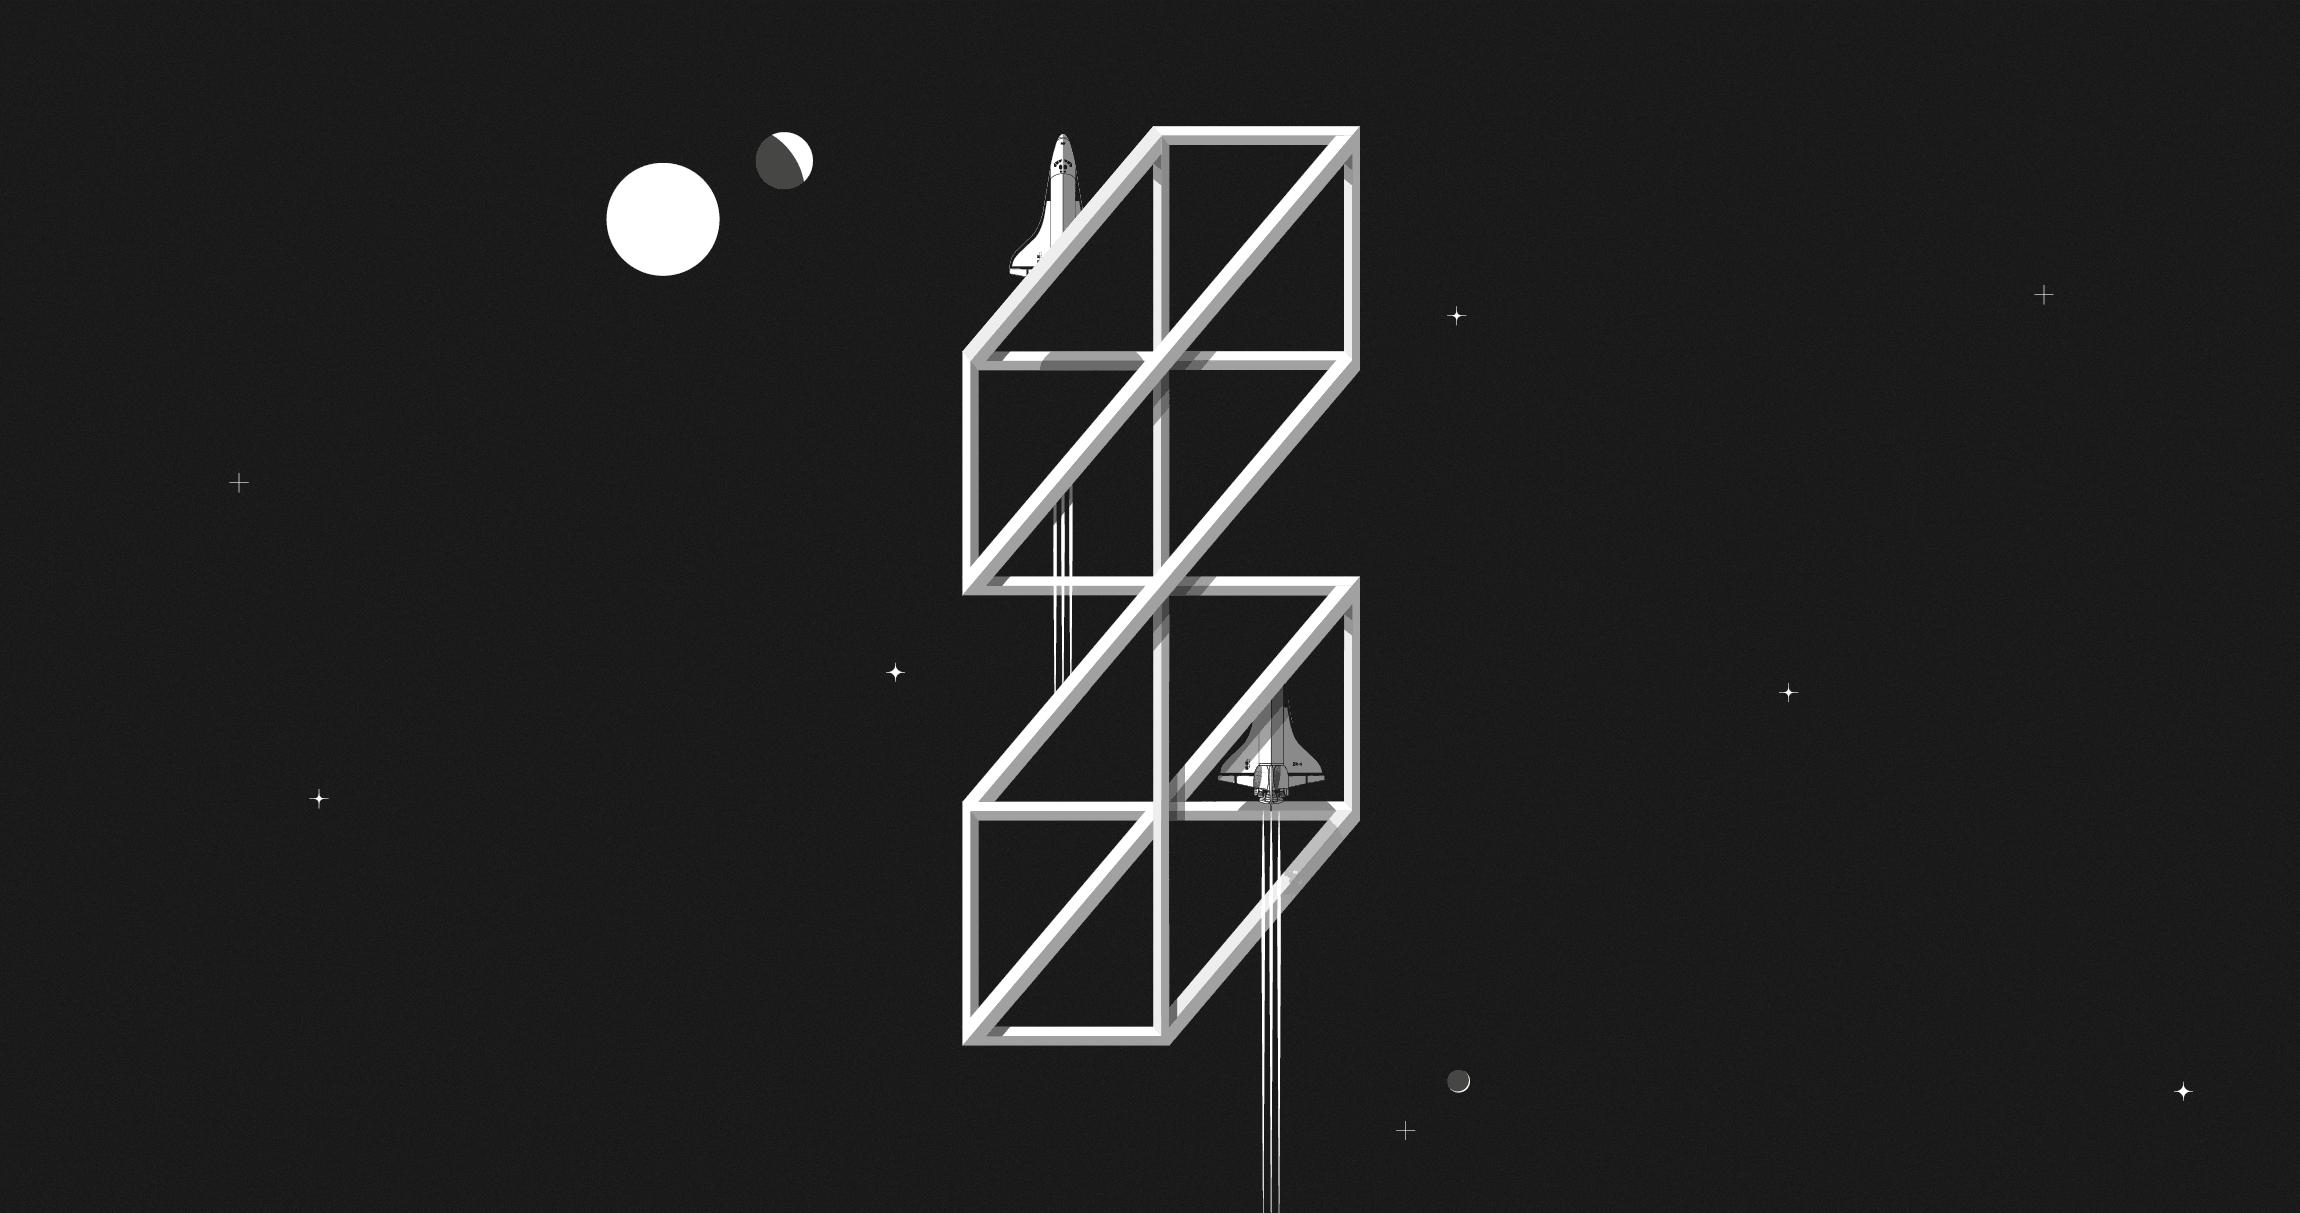 zr-space